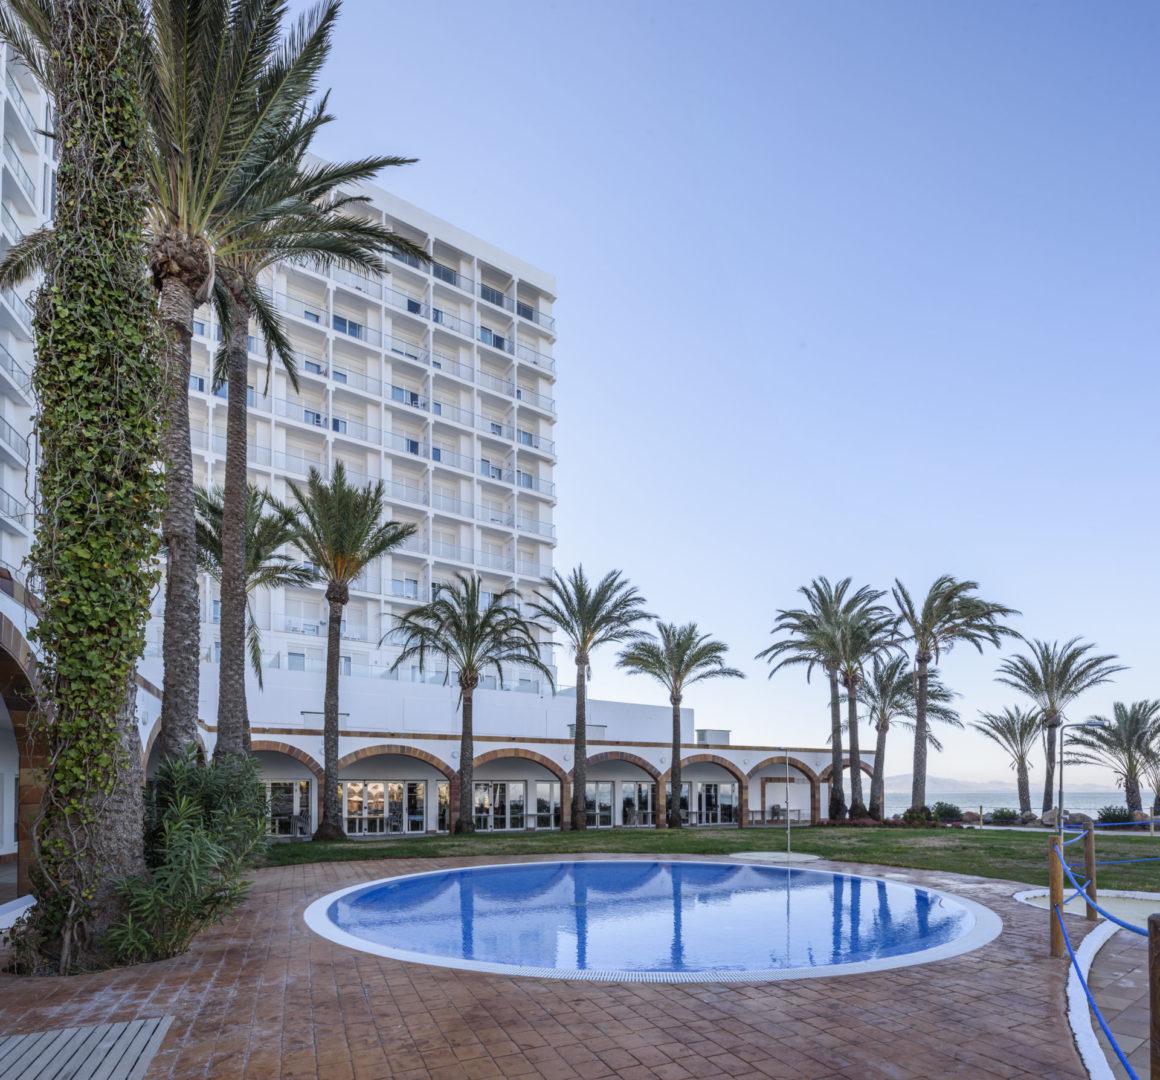 Hotel Doblemar 2-092-La Manga Urdecon